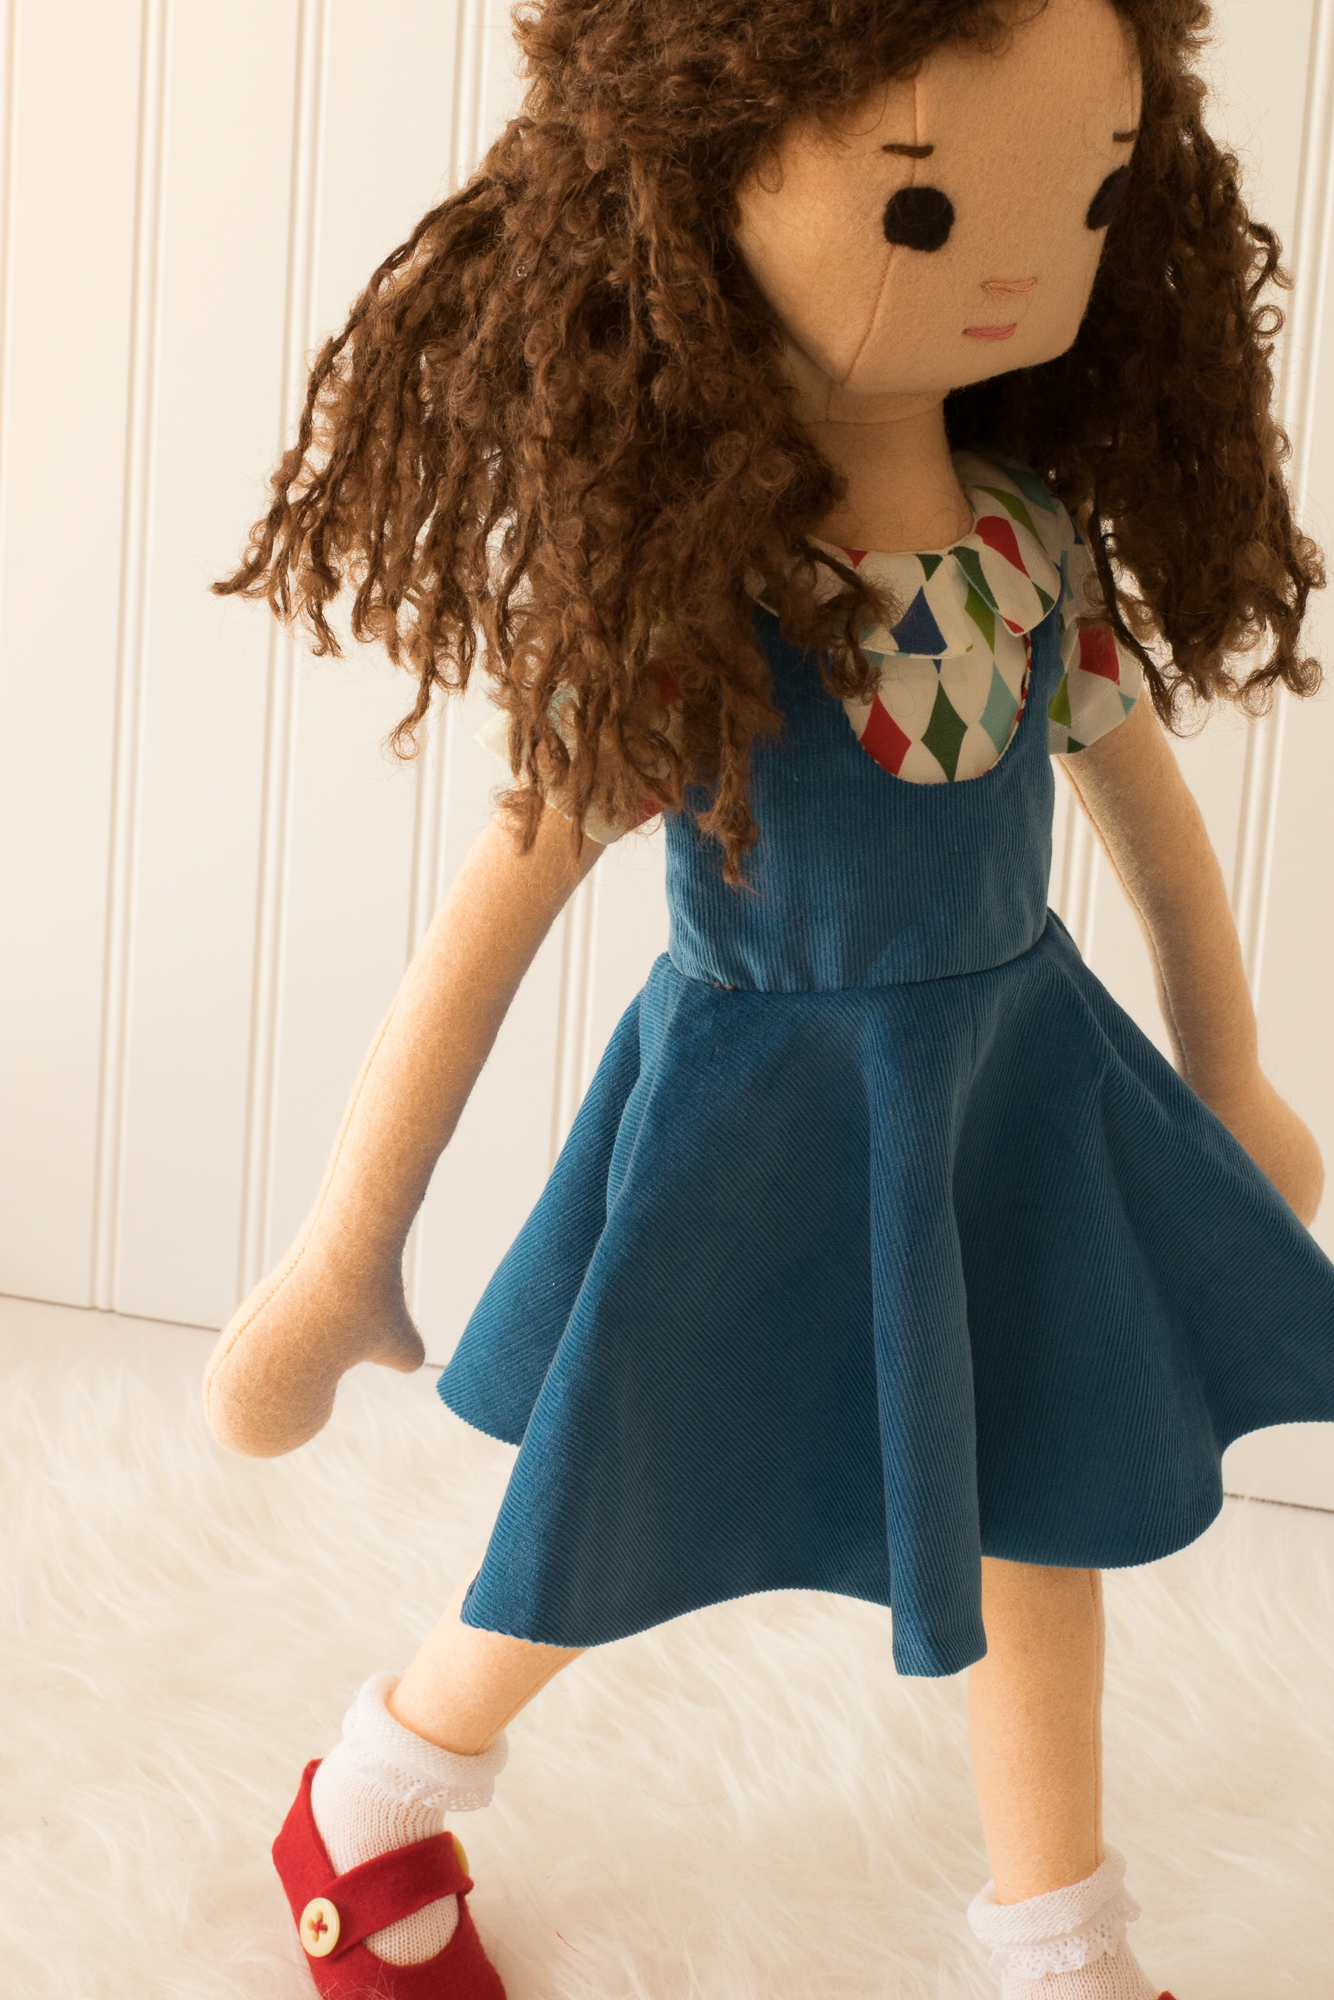 Gallery of Dolls-18.jpg